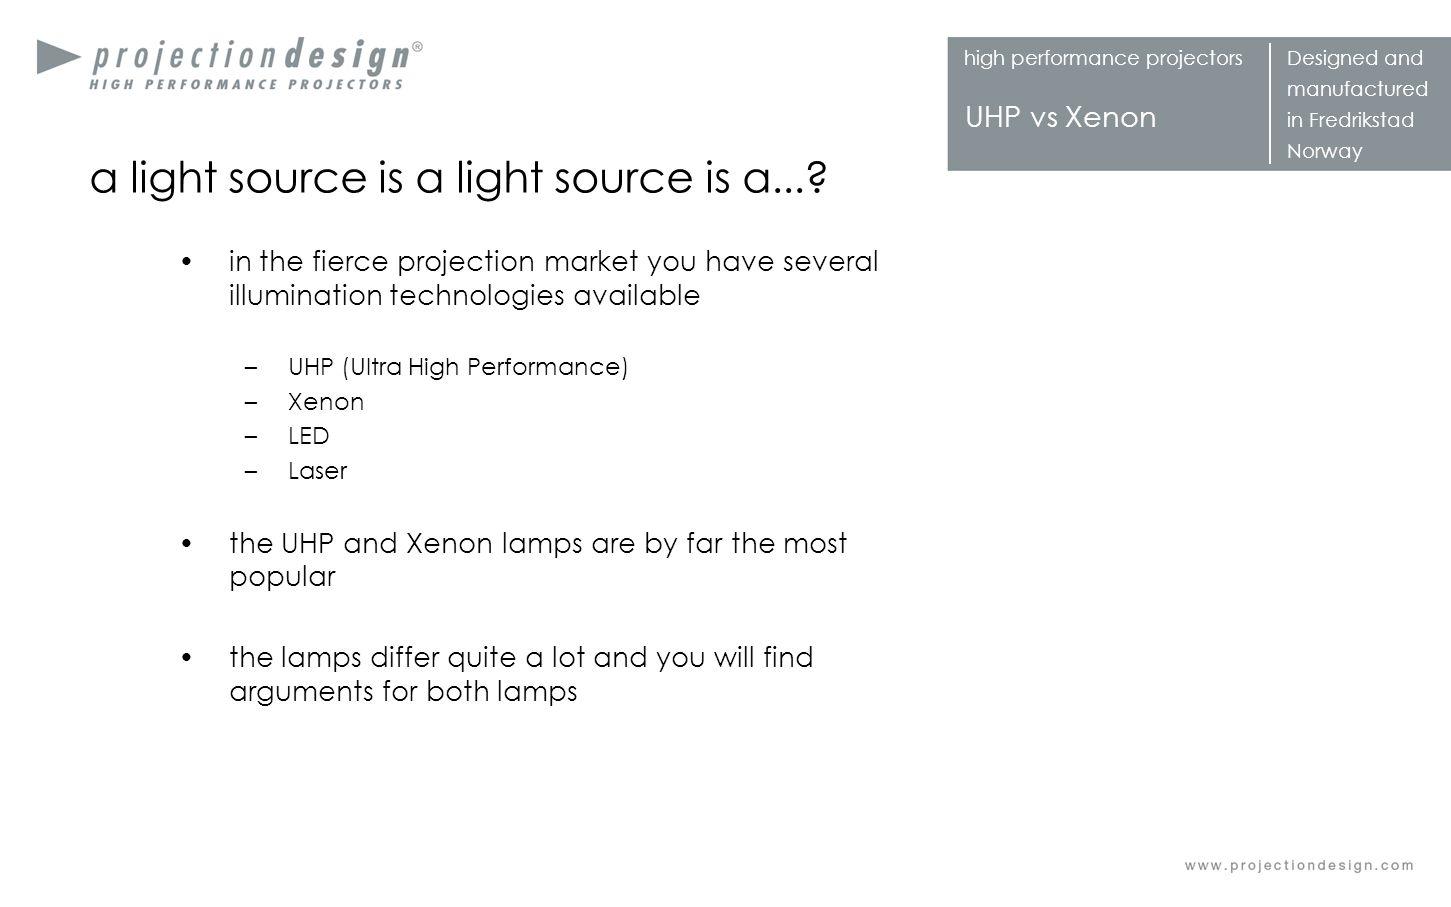 a light source is a light source is a...